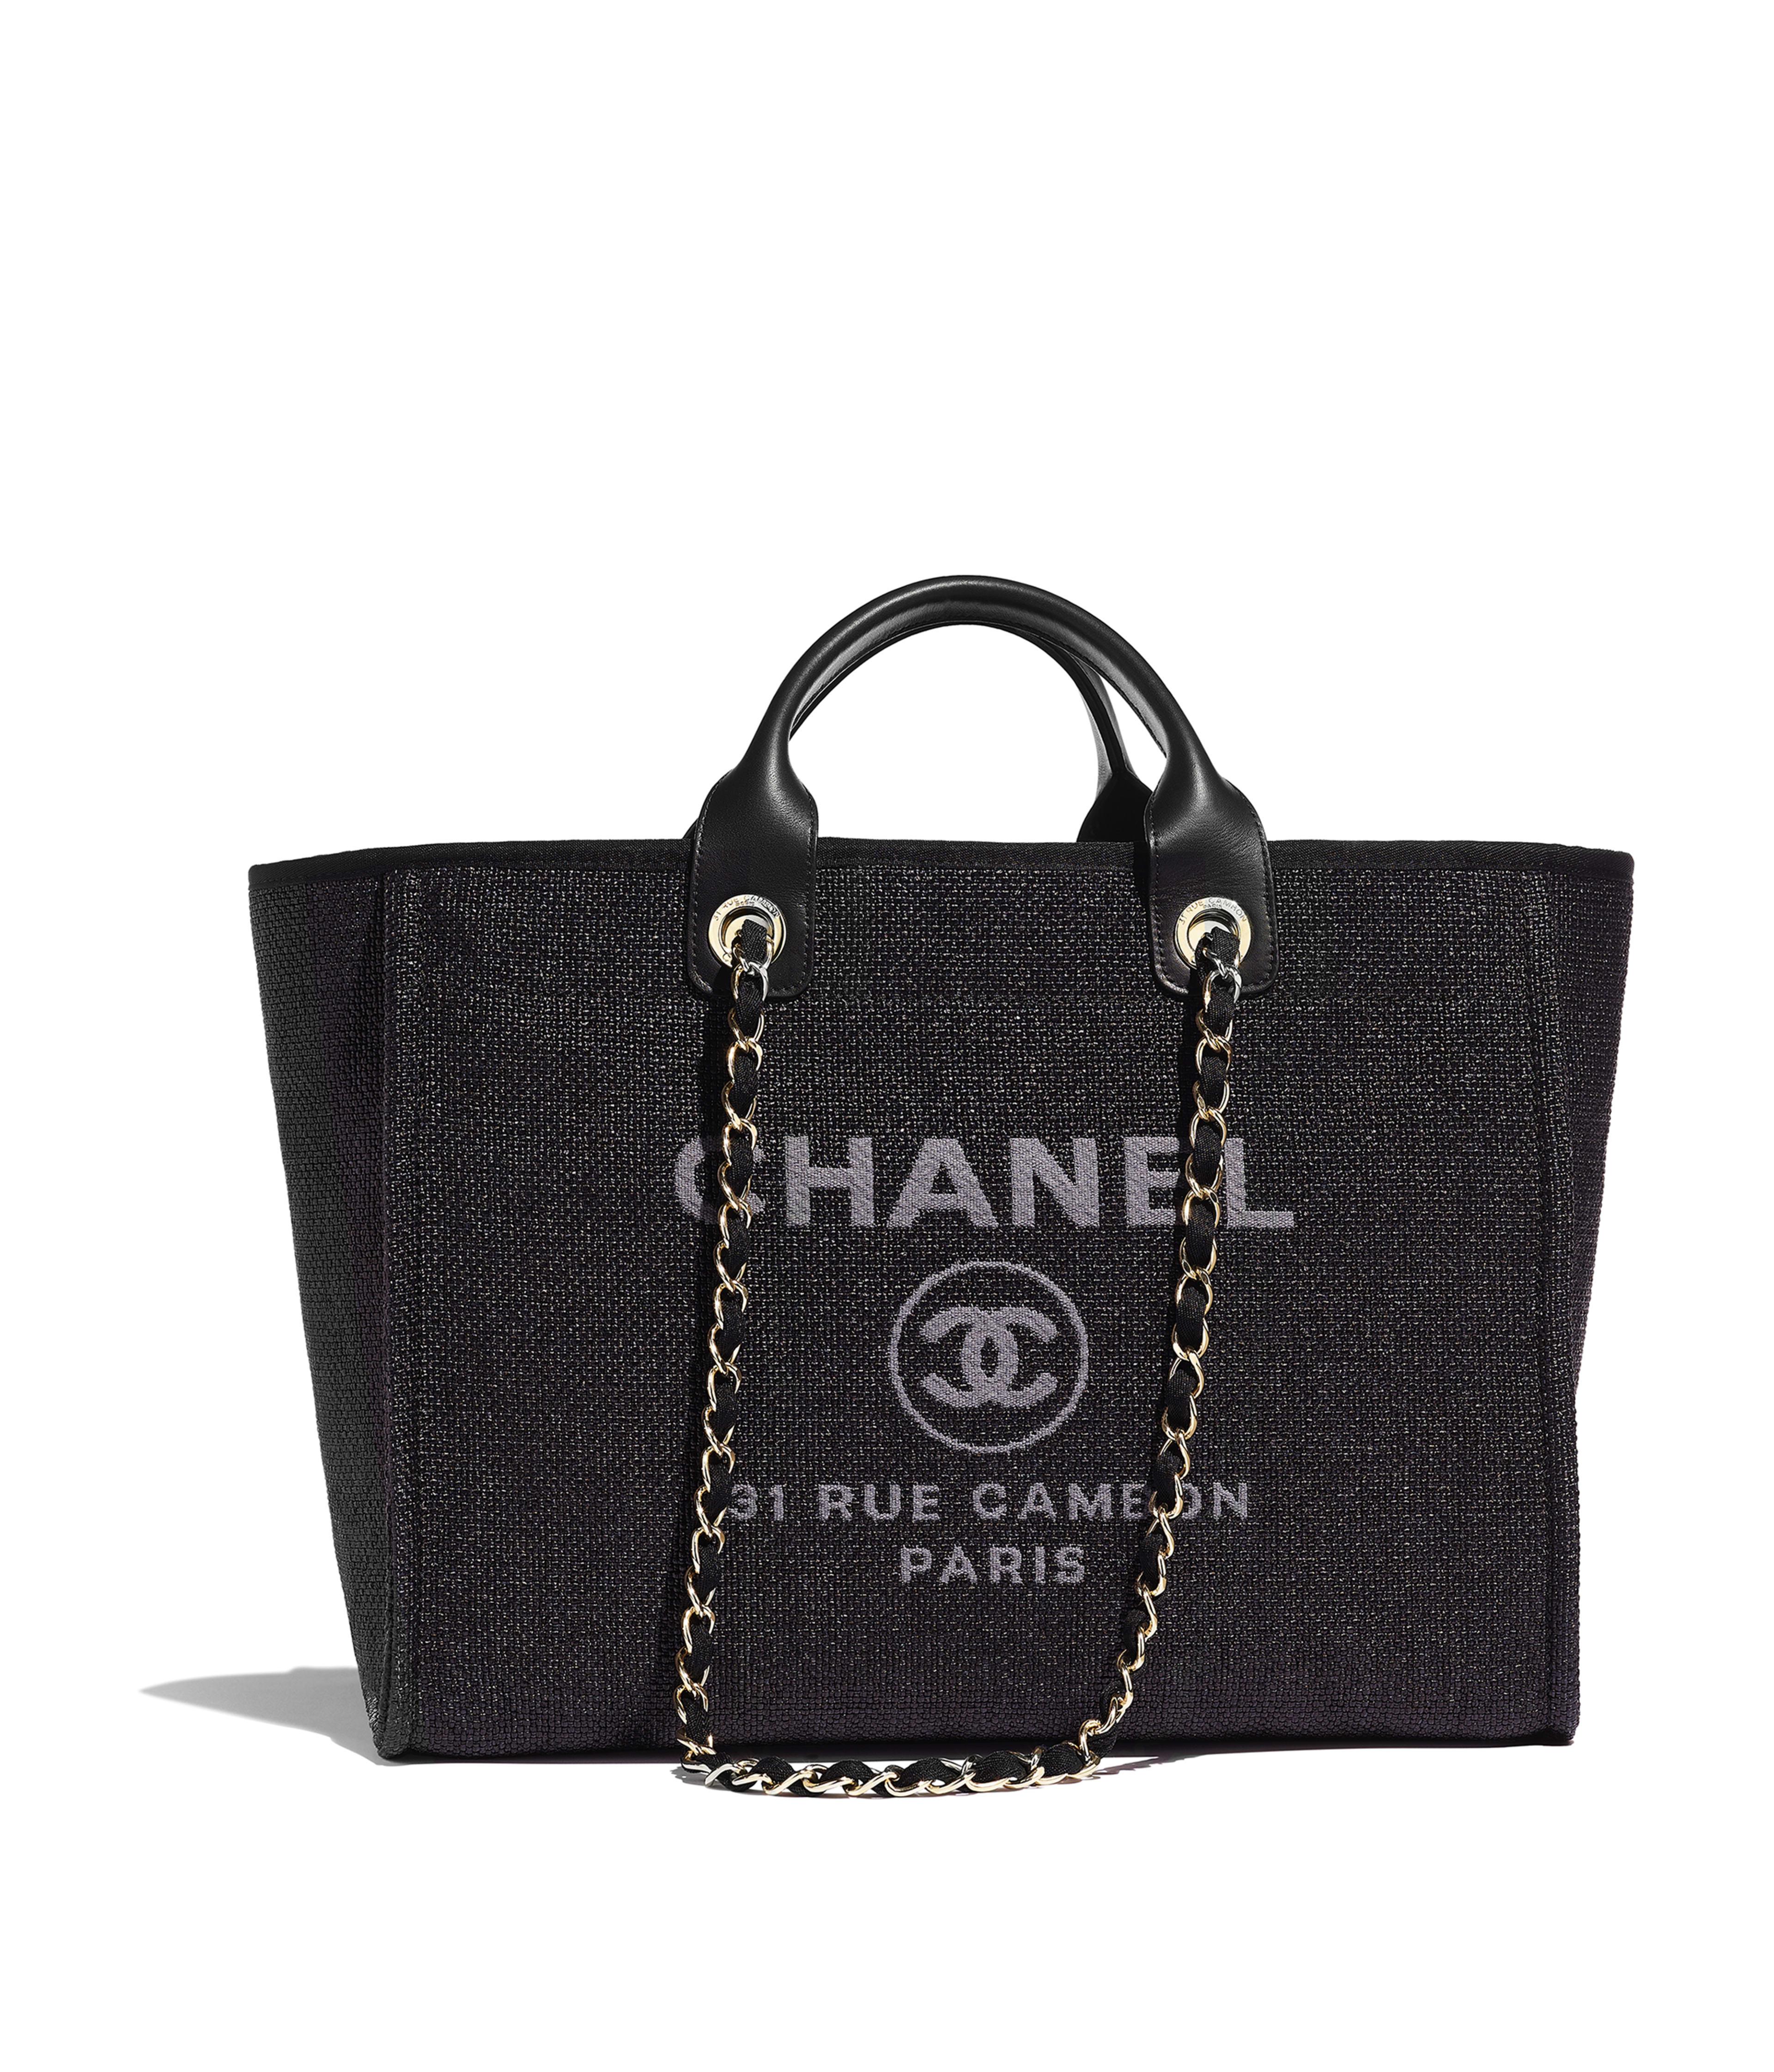 Ping Bag Cotton Nylon Calfskin Gold Tone Metal Black Ref A66941y8411794305